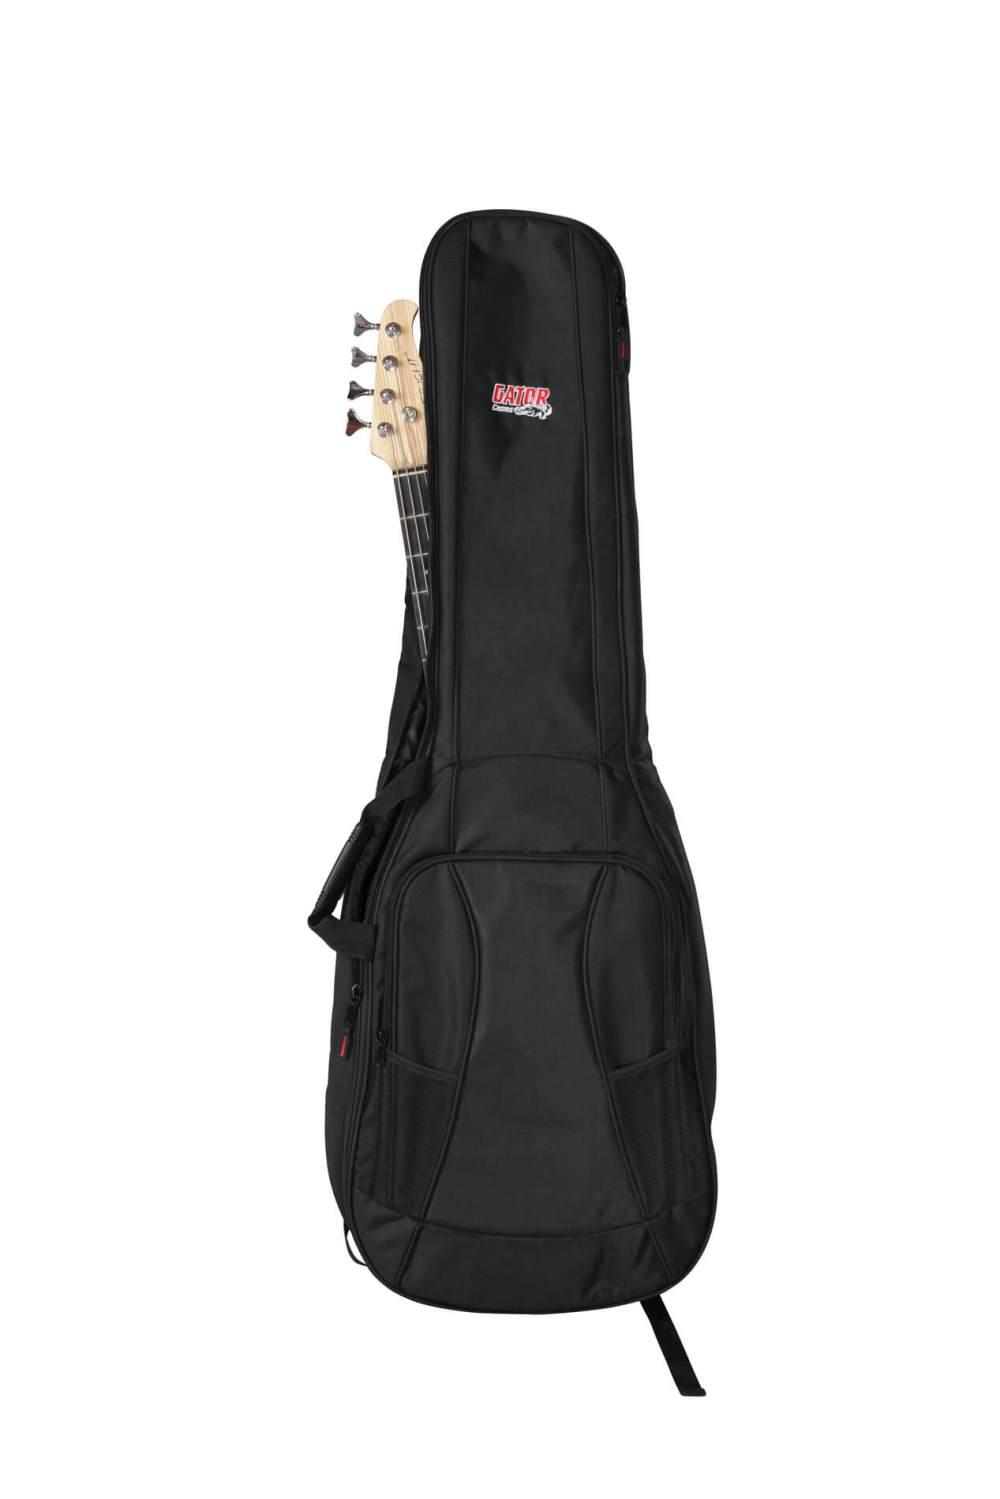 medium resolution of dual bass guitar gig bag gb 4g bassx2 gator cases